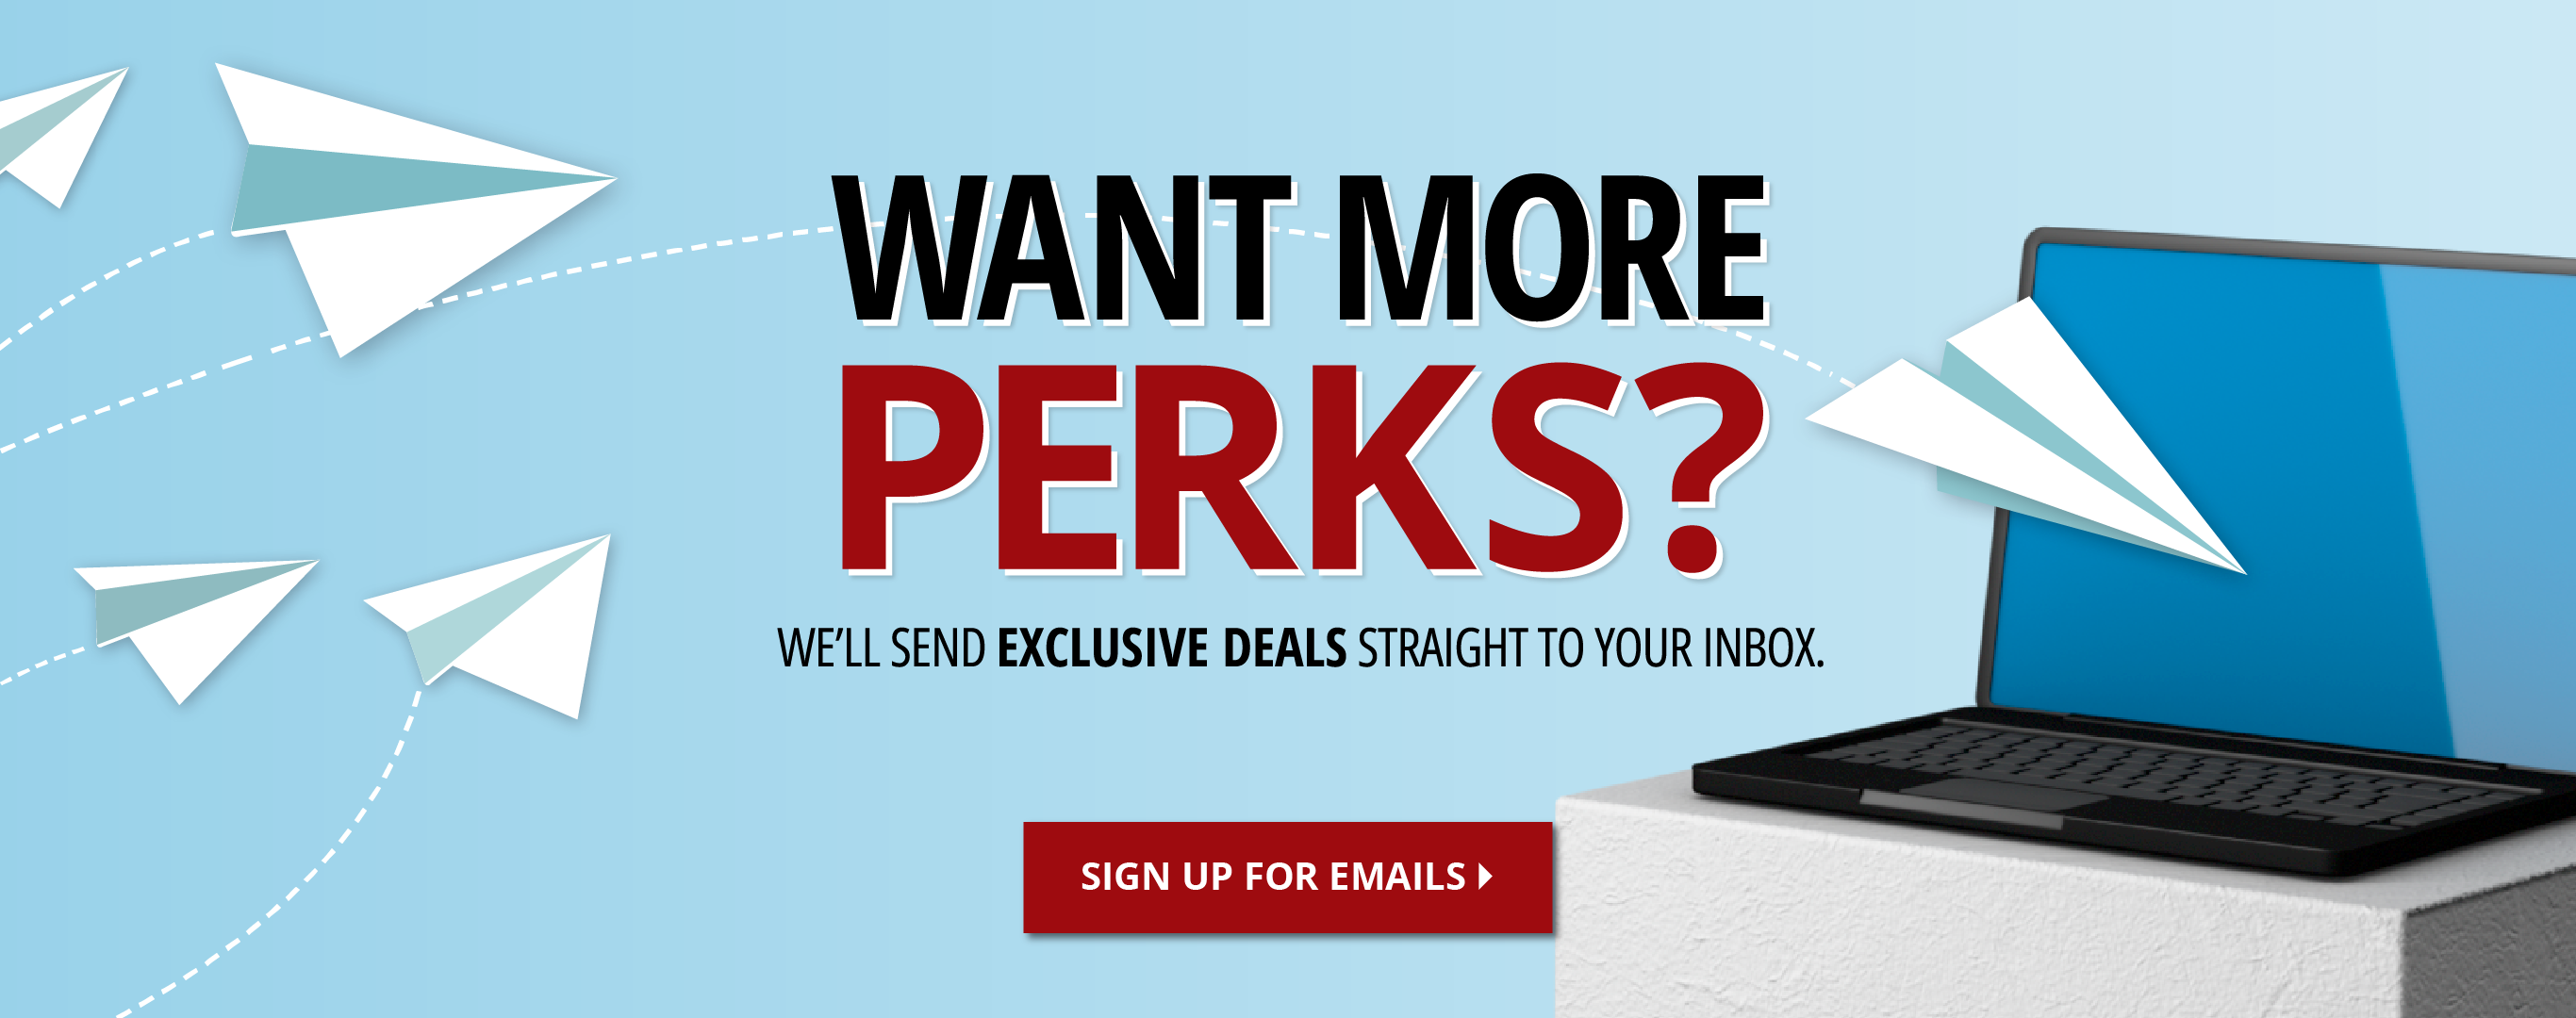 HC201211-Jan20_FP_Deals_Email-Desk.png